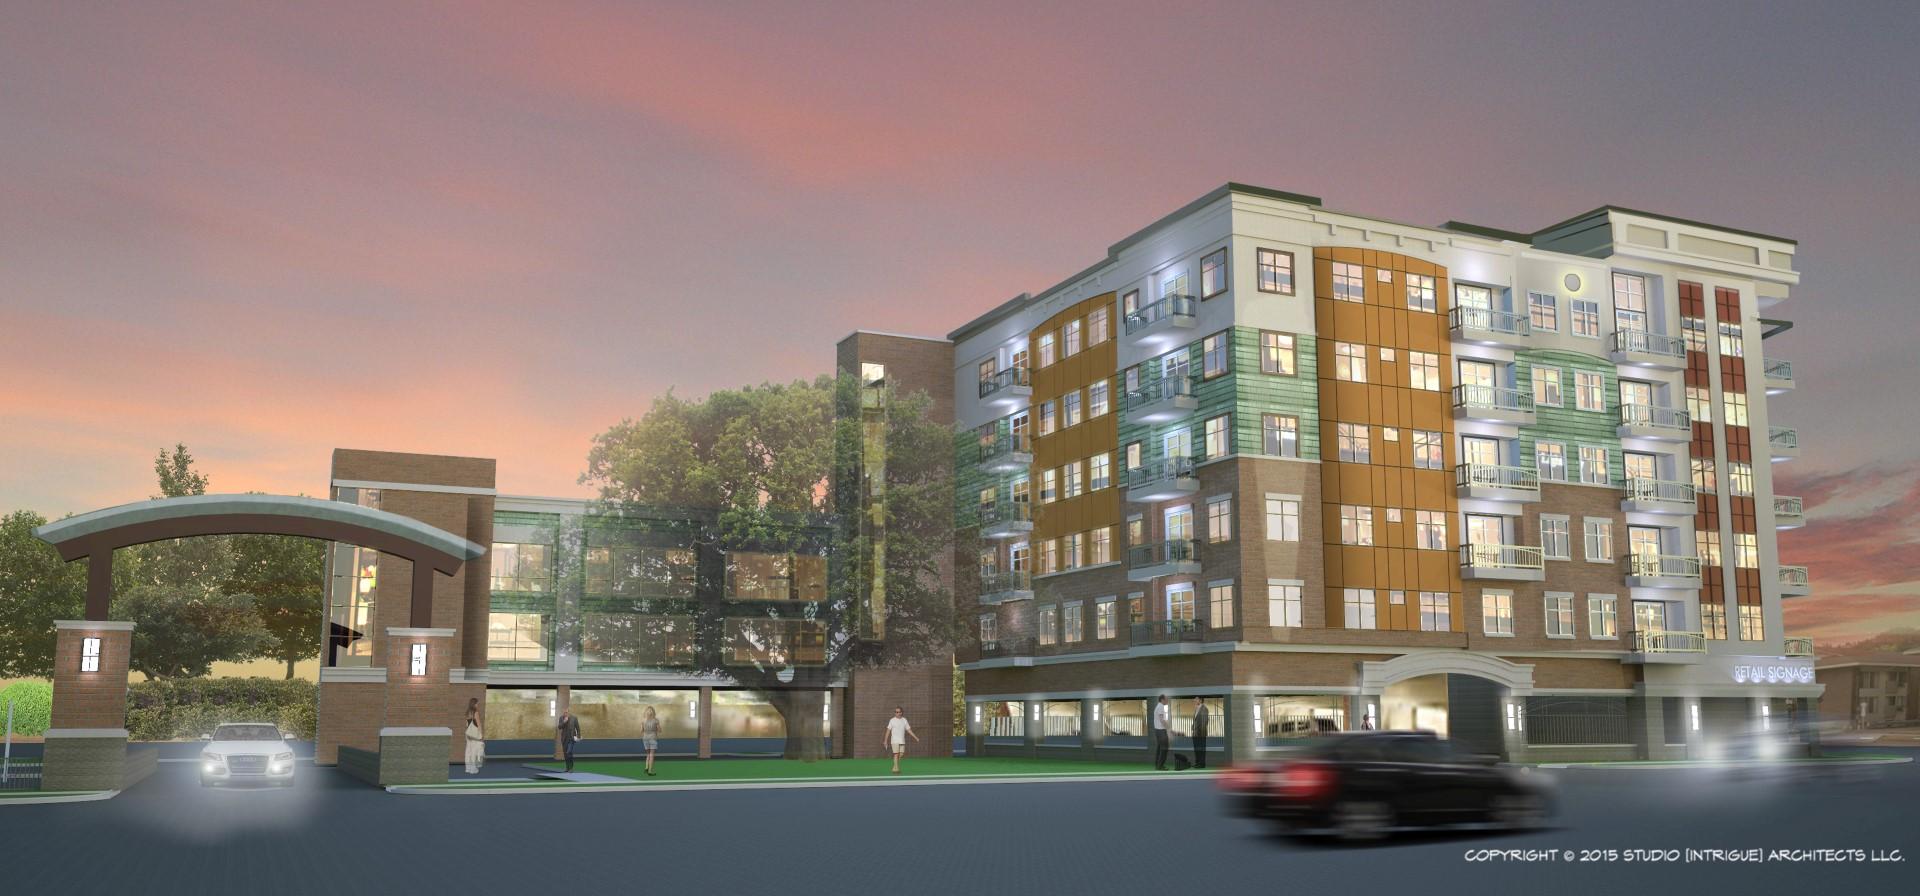 Spartan Ave Complex - East Lansing, MI